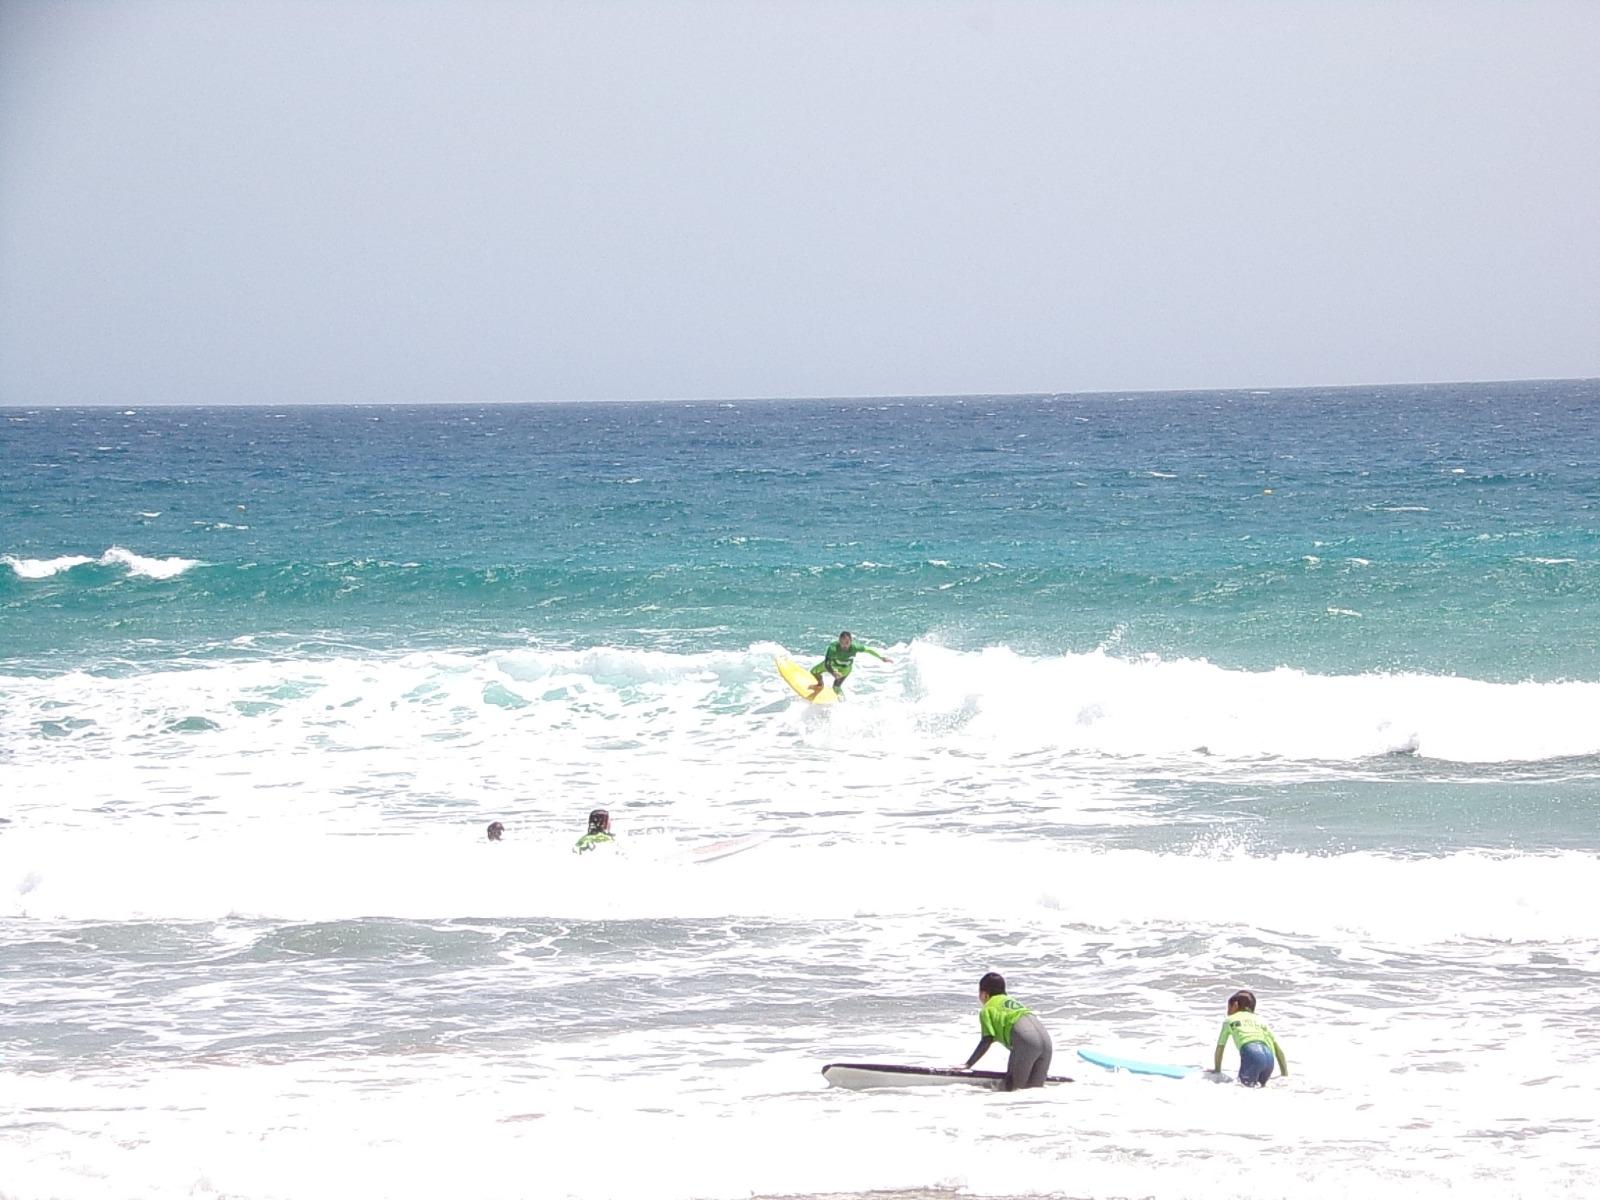 VERANO 2019 2 FUERTE TRIBU SURFWhatsApp Image 2019-08-15 at 15.48.08.jpeg